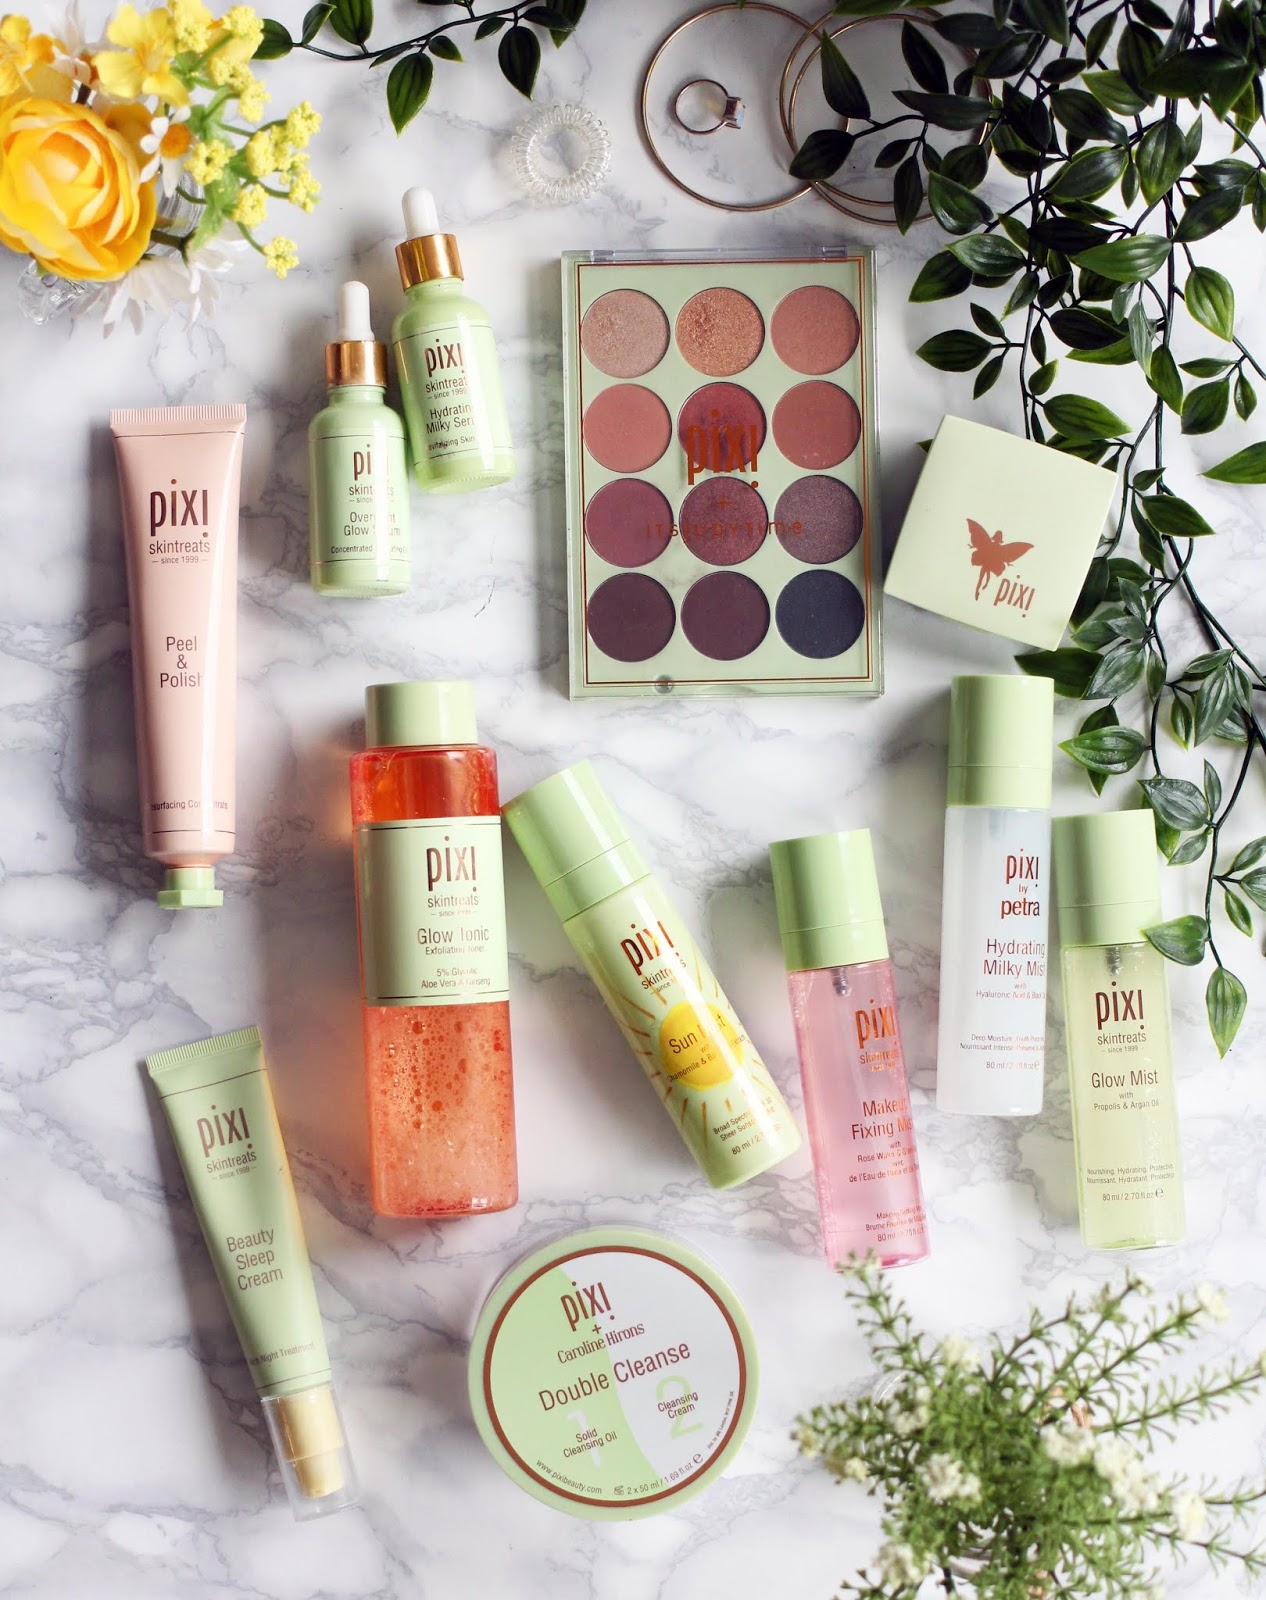 Pixi Beauty // Brand Focus